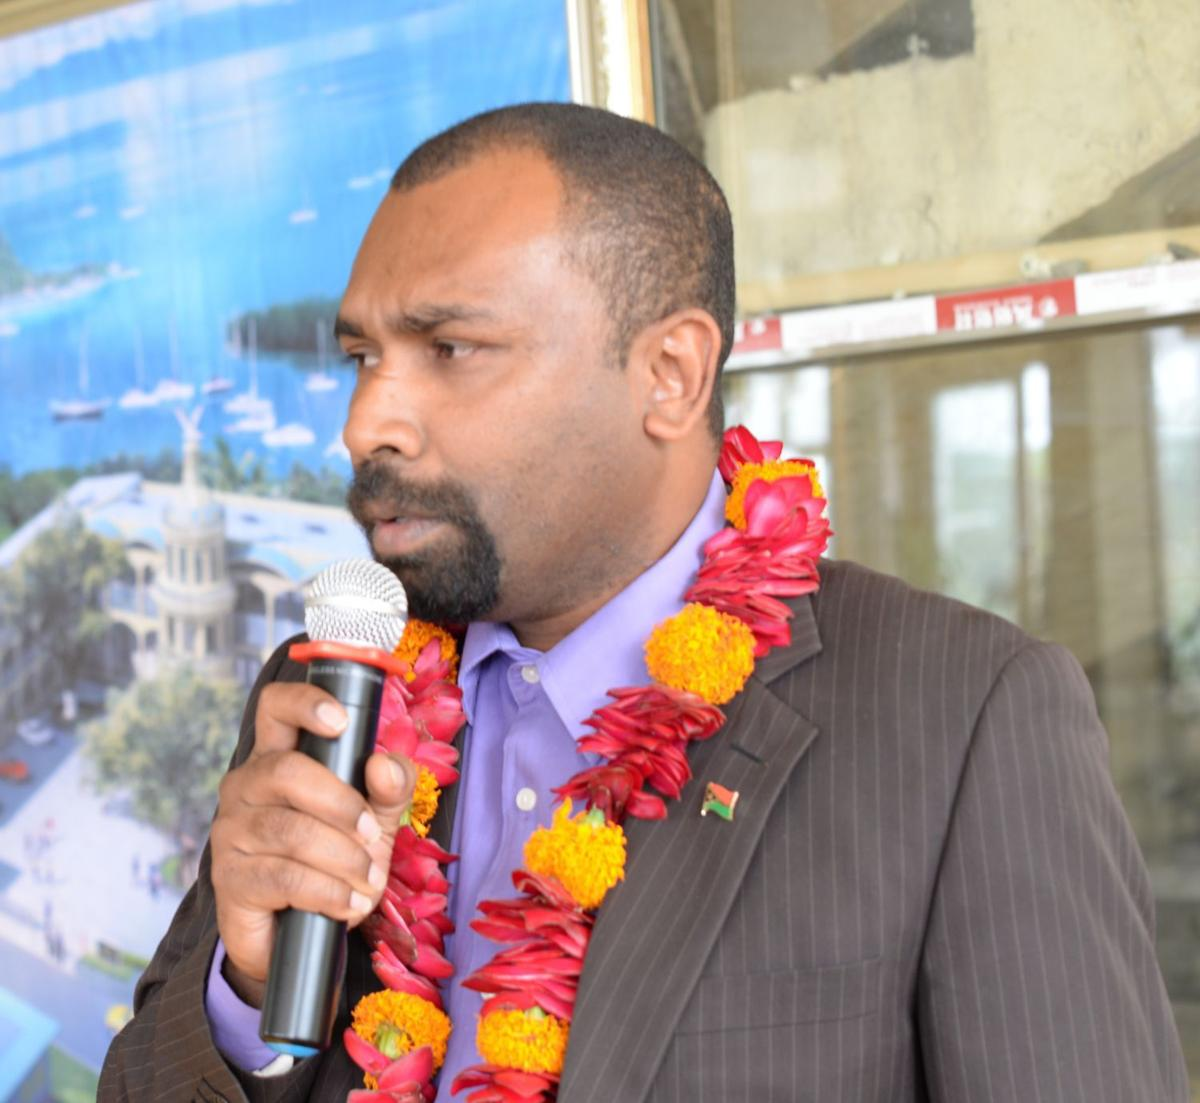 PSC Chairman, Martin Mahe